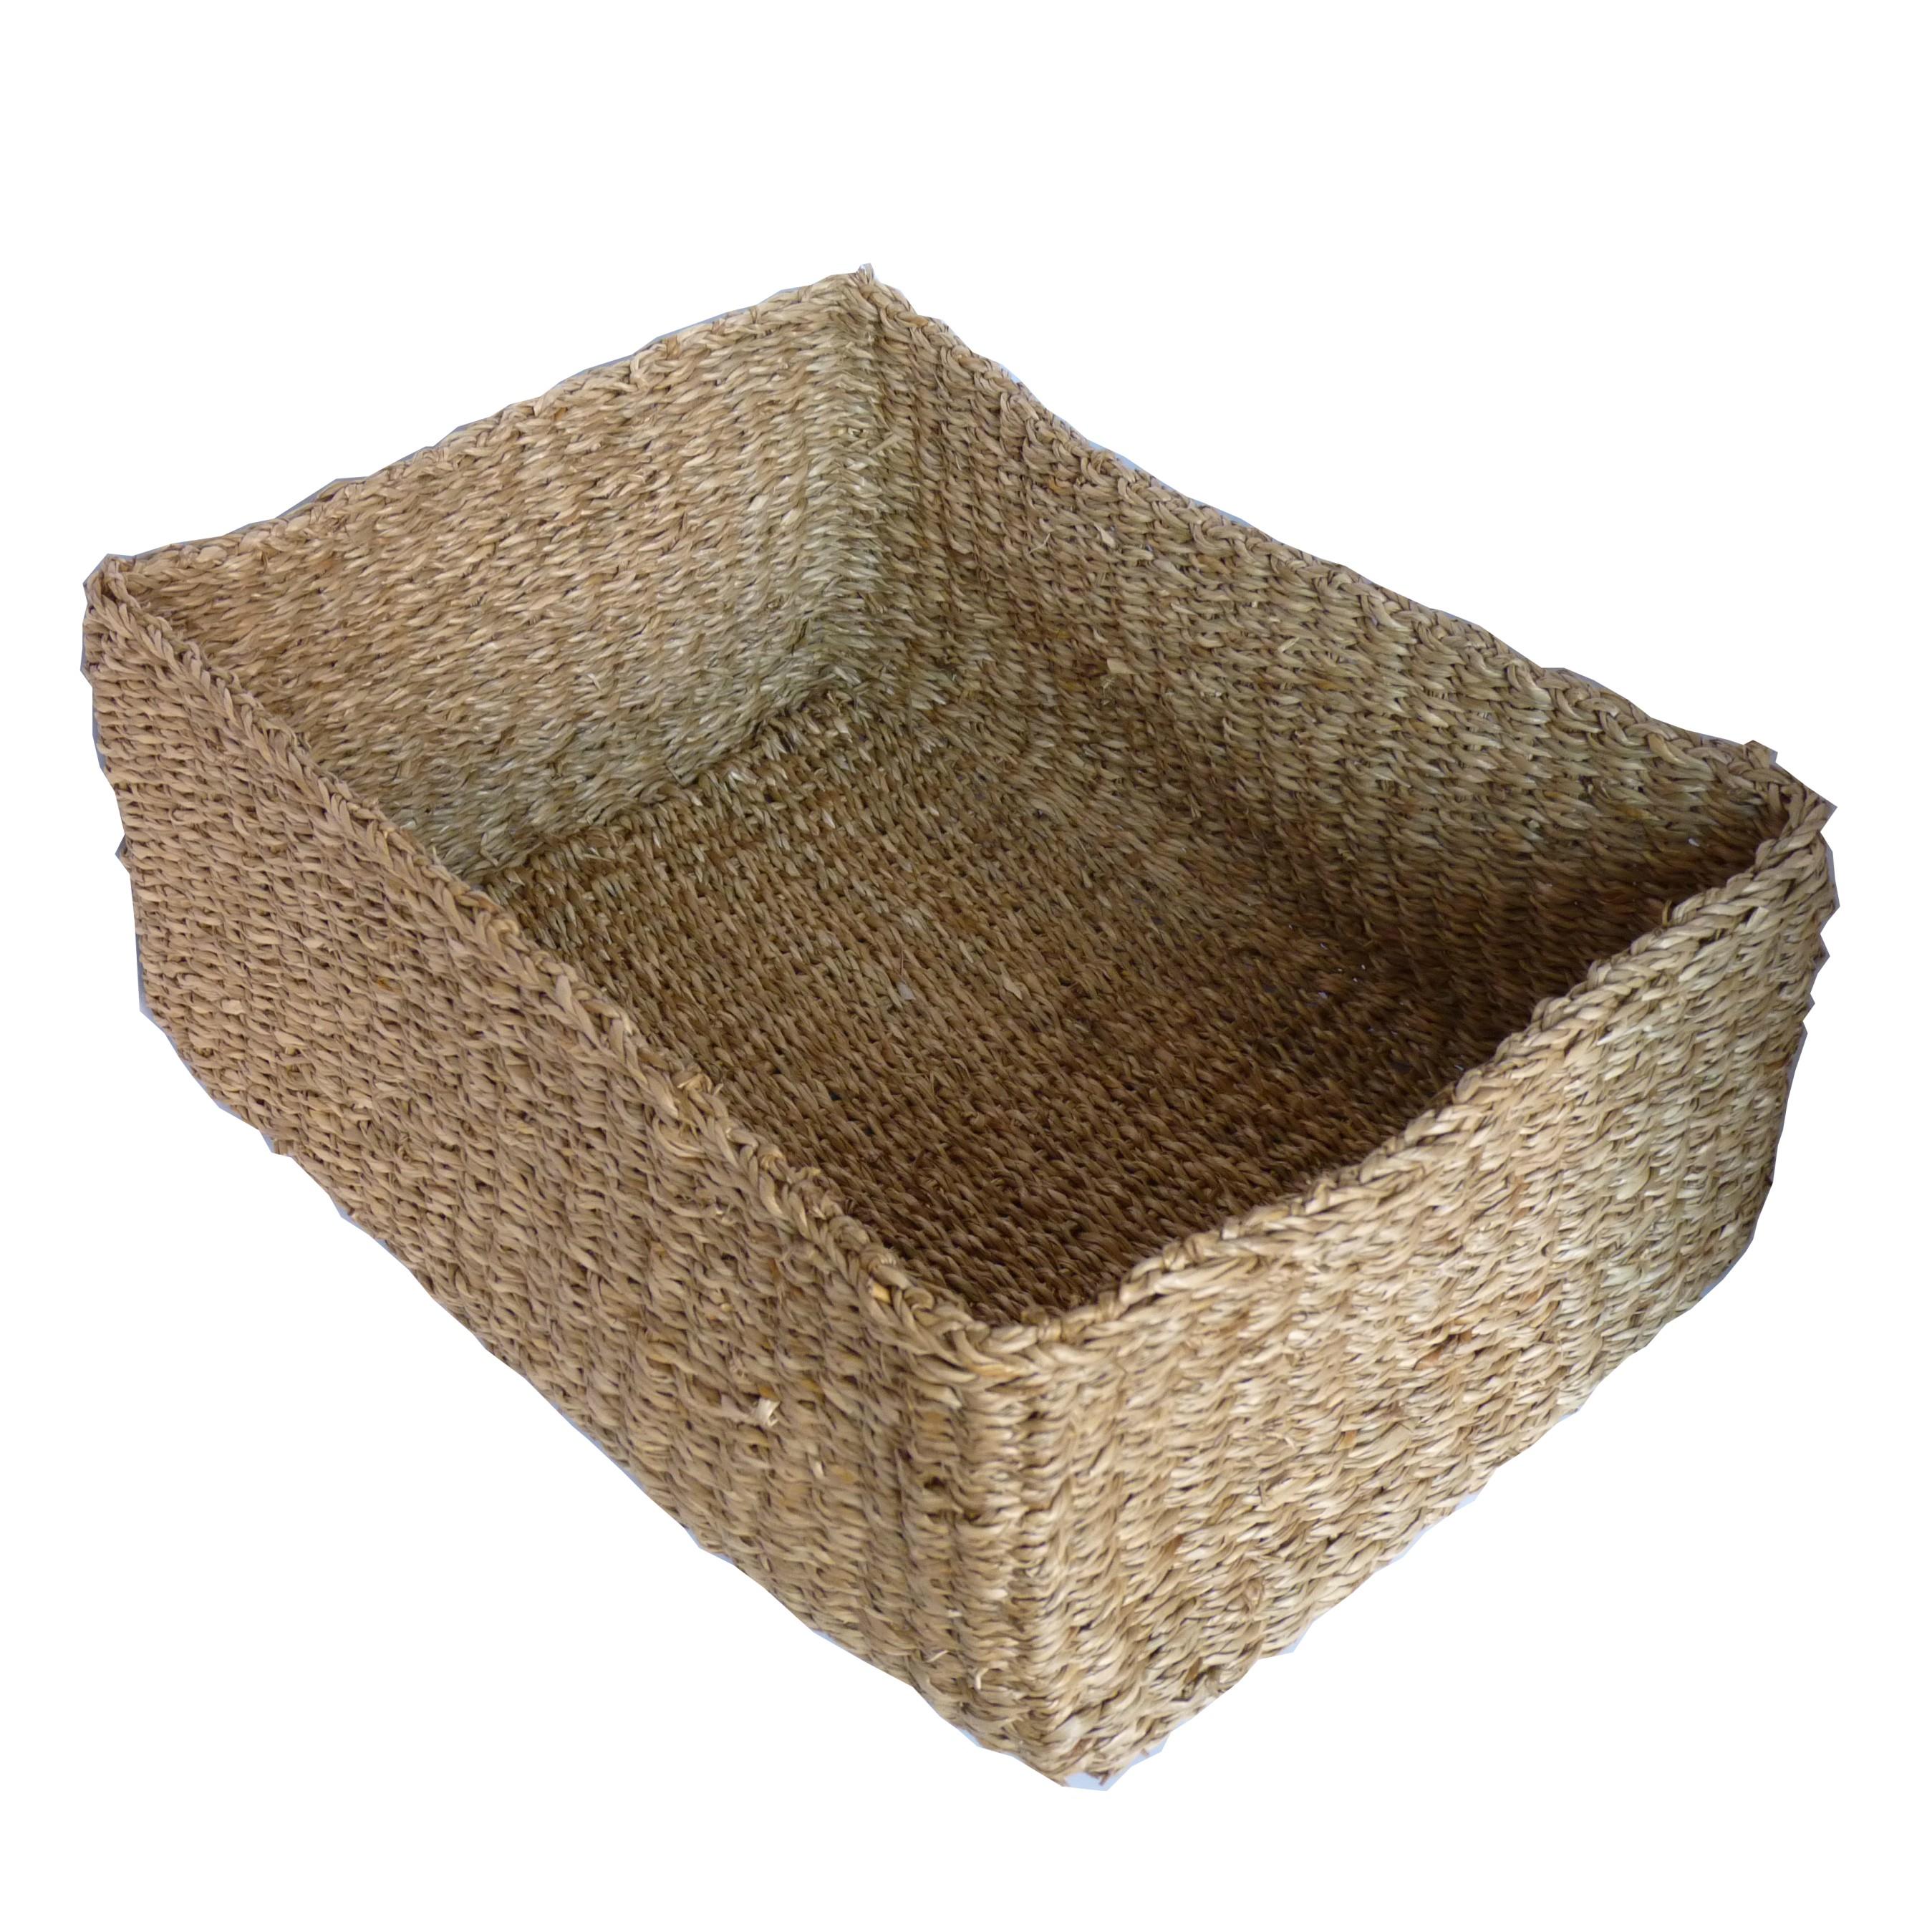 seegras korb schmink k rbchen aufbewahrung rechteckig. Black Bedroom Furniture Sets. Home Design Ideas